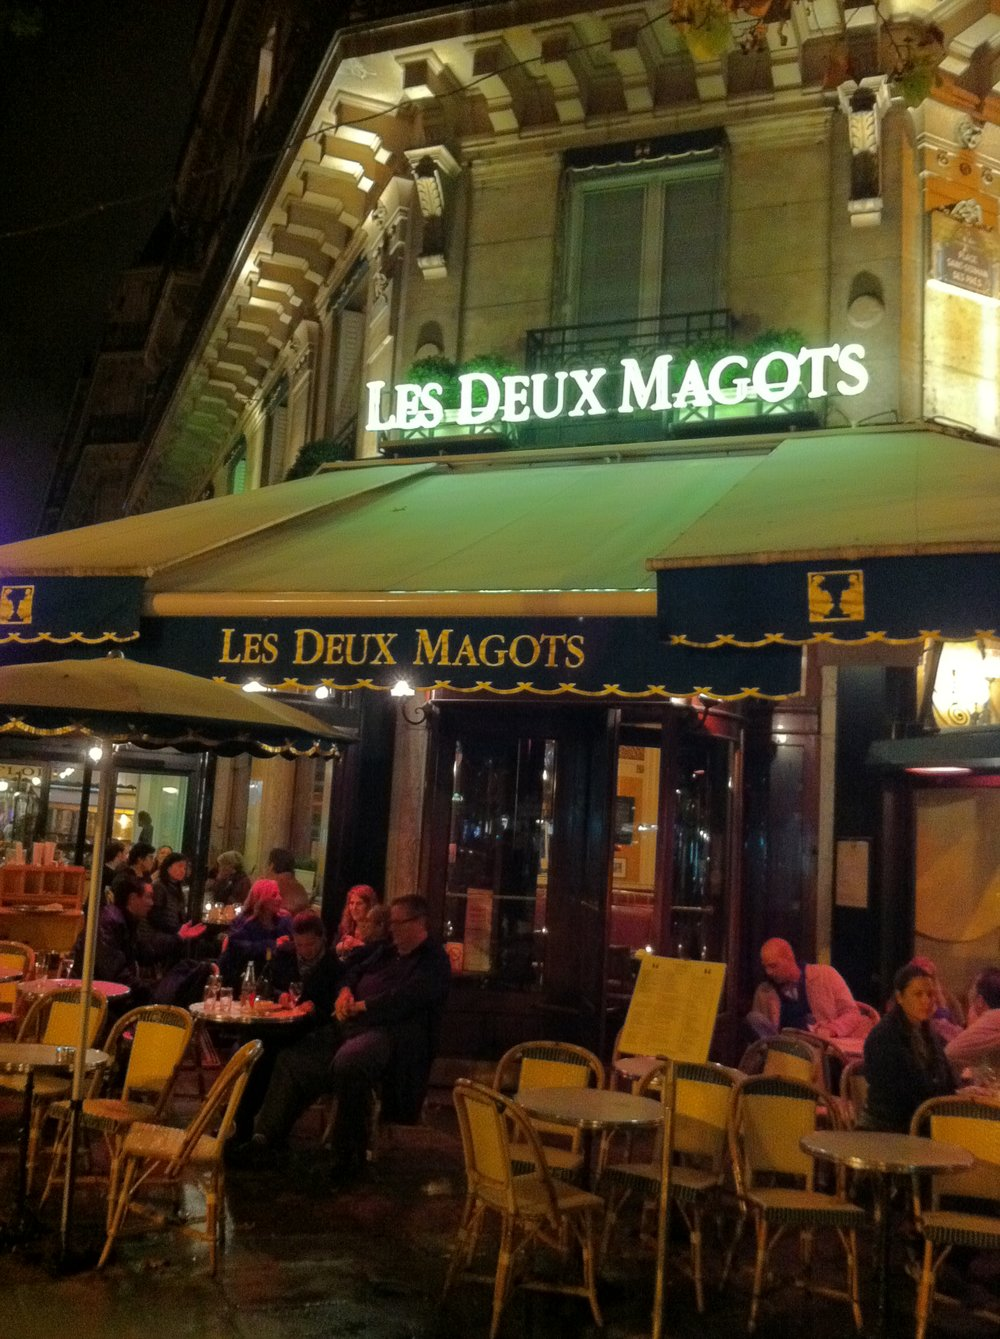 Les Deux Magots - Wandering Jokas Travel Blog